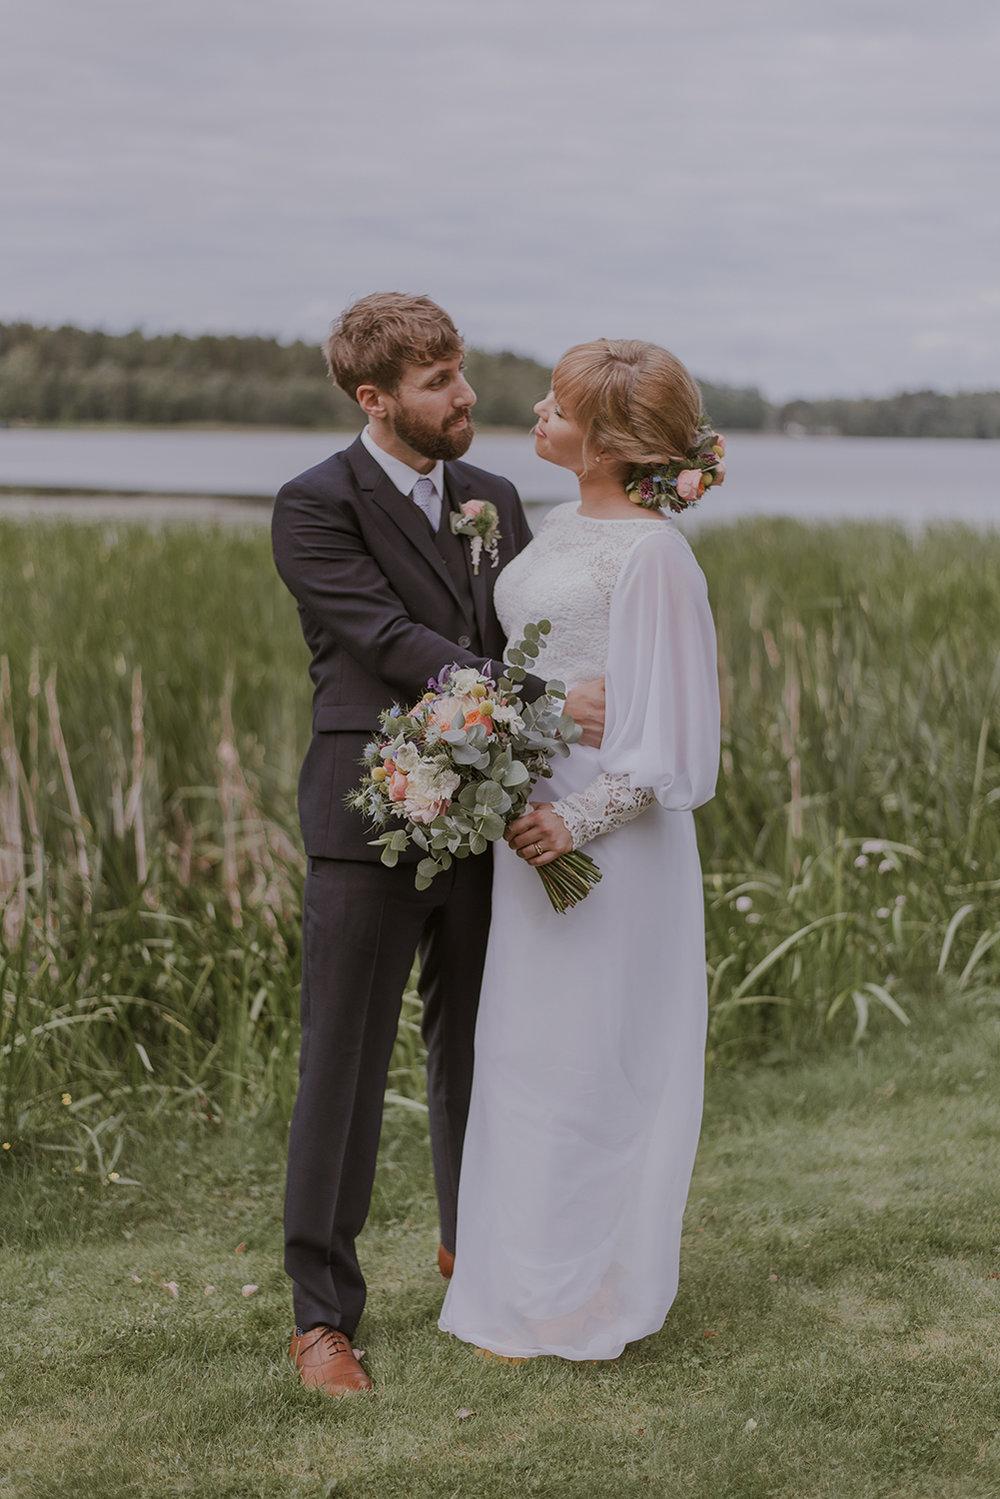 brollopsfotograf-smaland-seos-fotografi-sweden-wedding-photographer